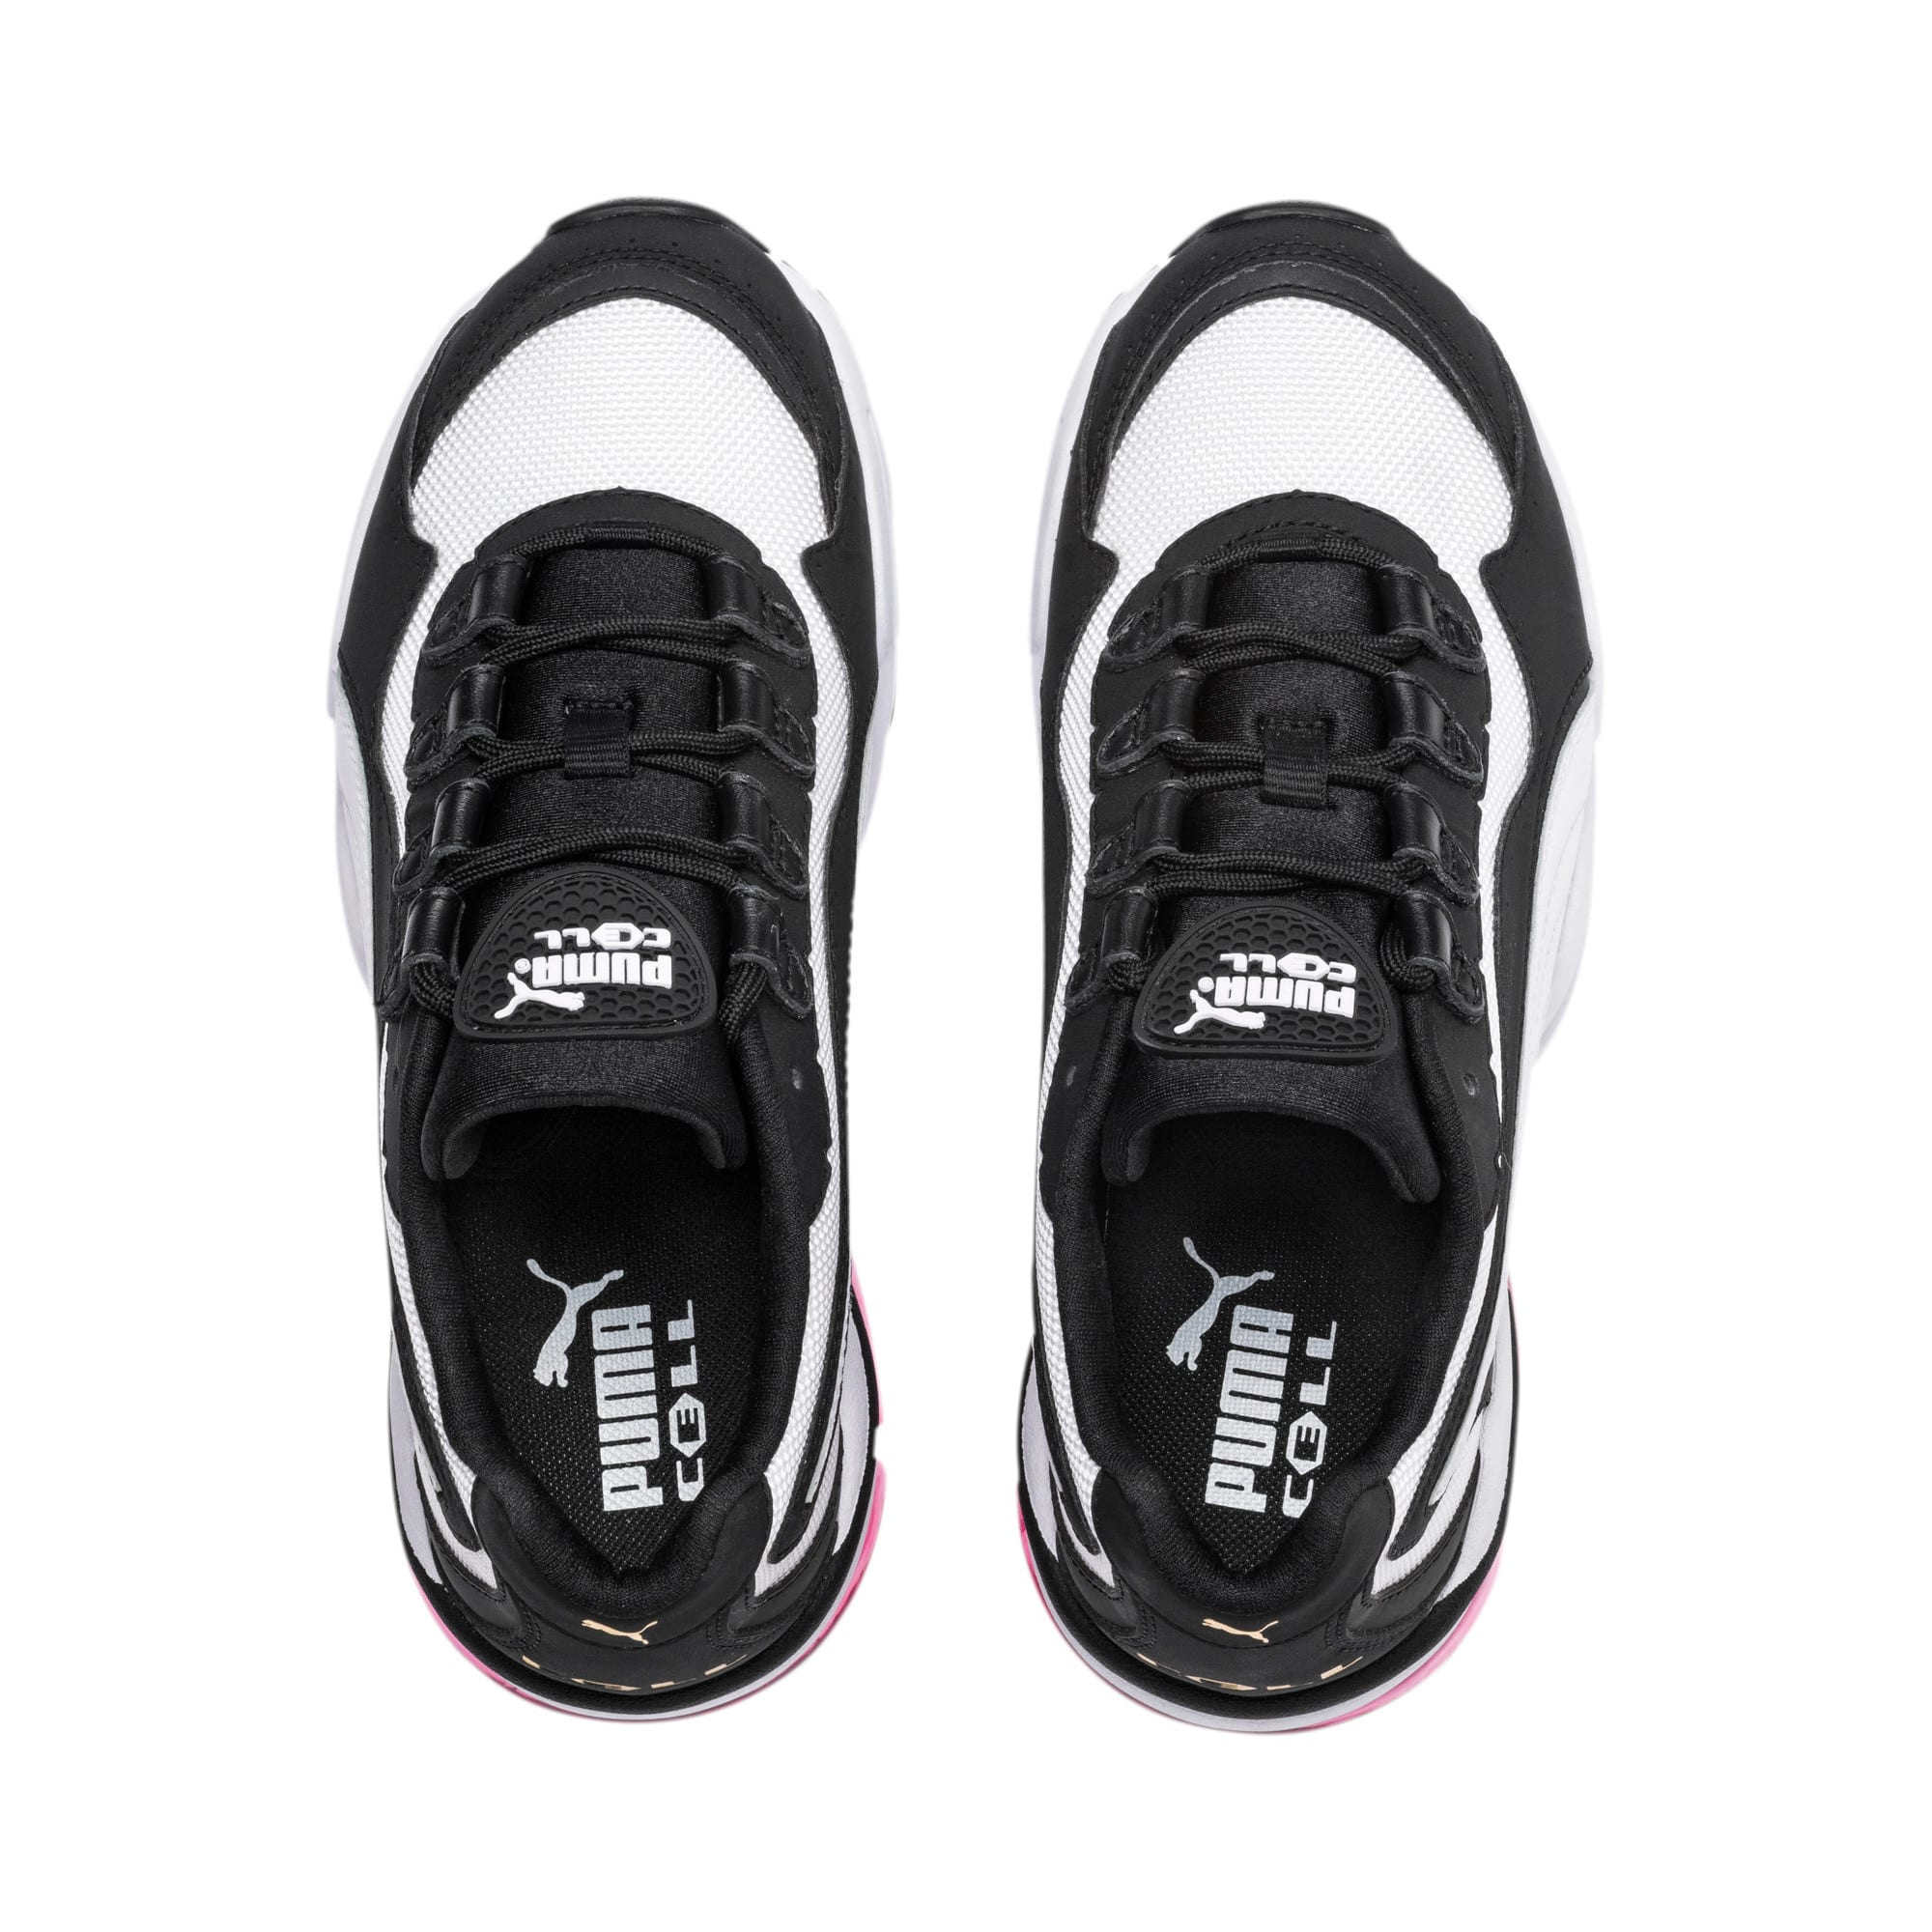 Thumbnail 6 of CELL Stellar Women's Sneakers, Puma White-Puma Black, medium